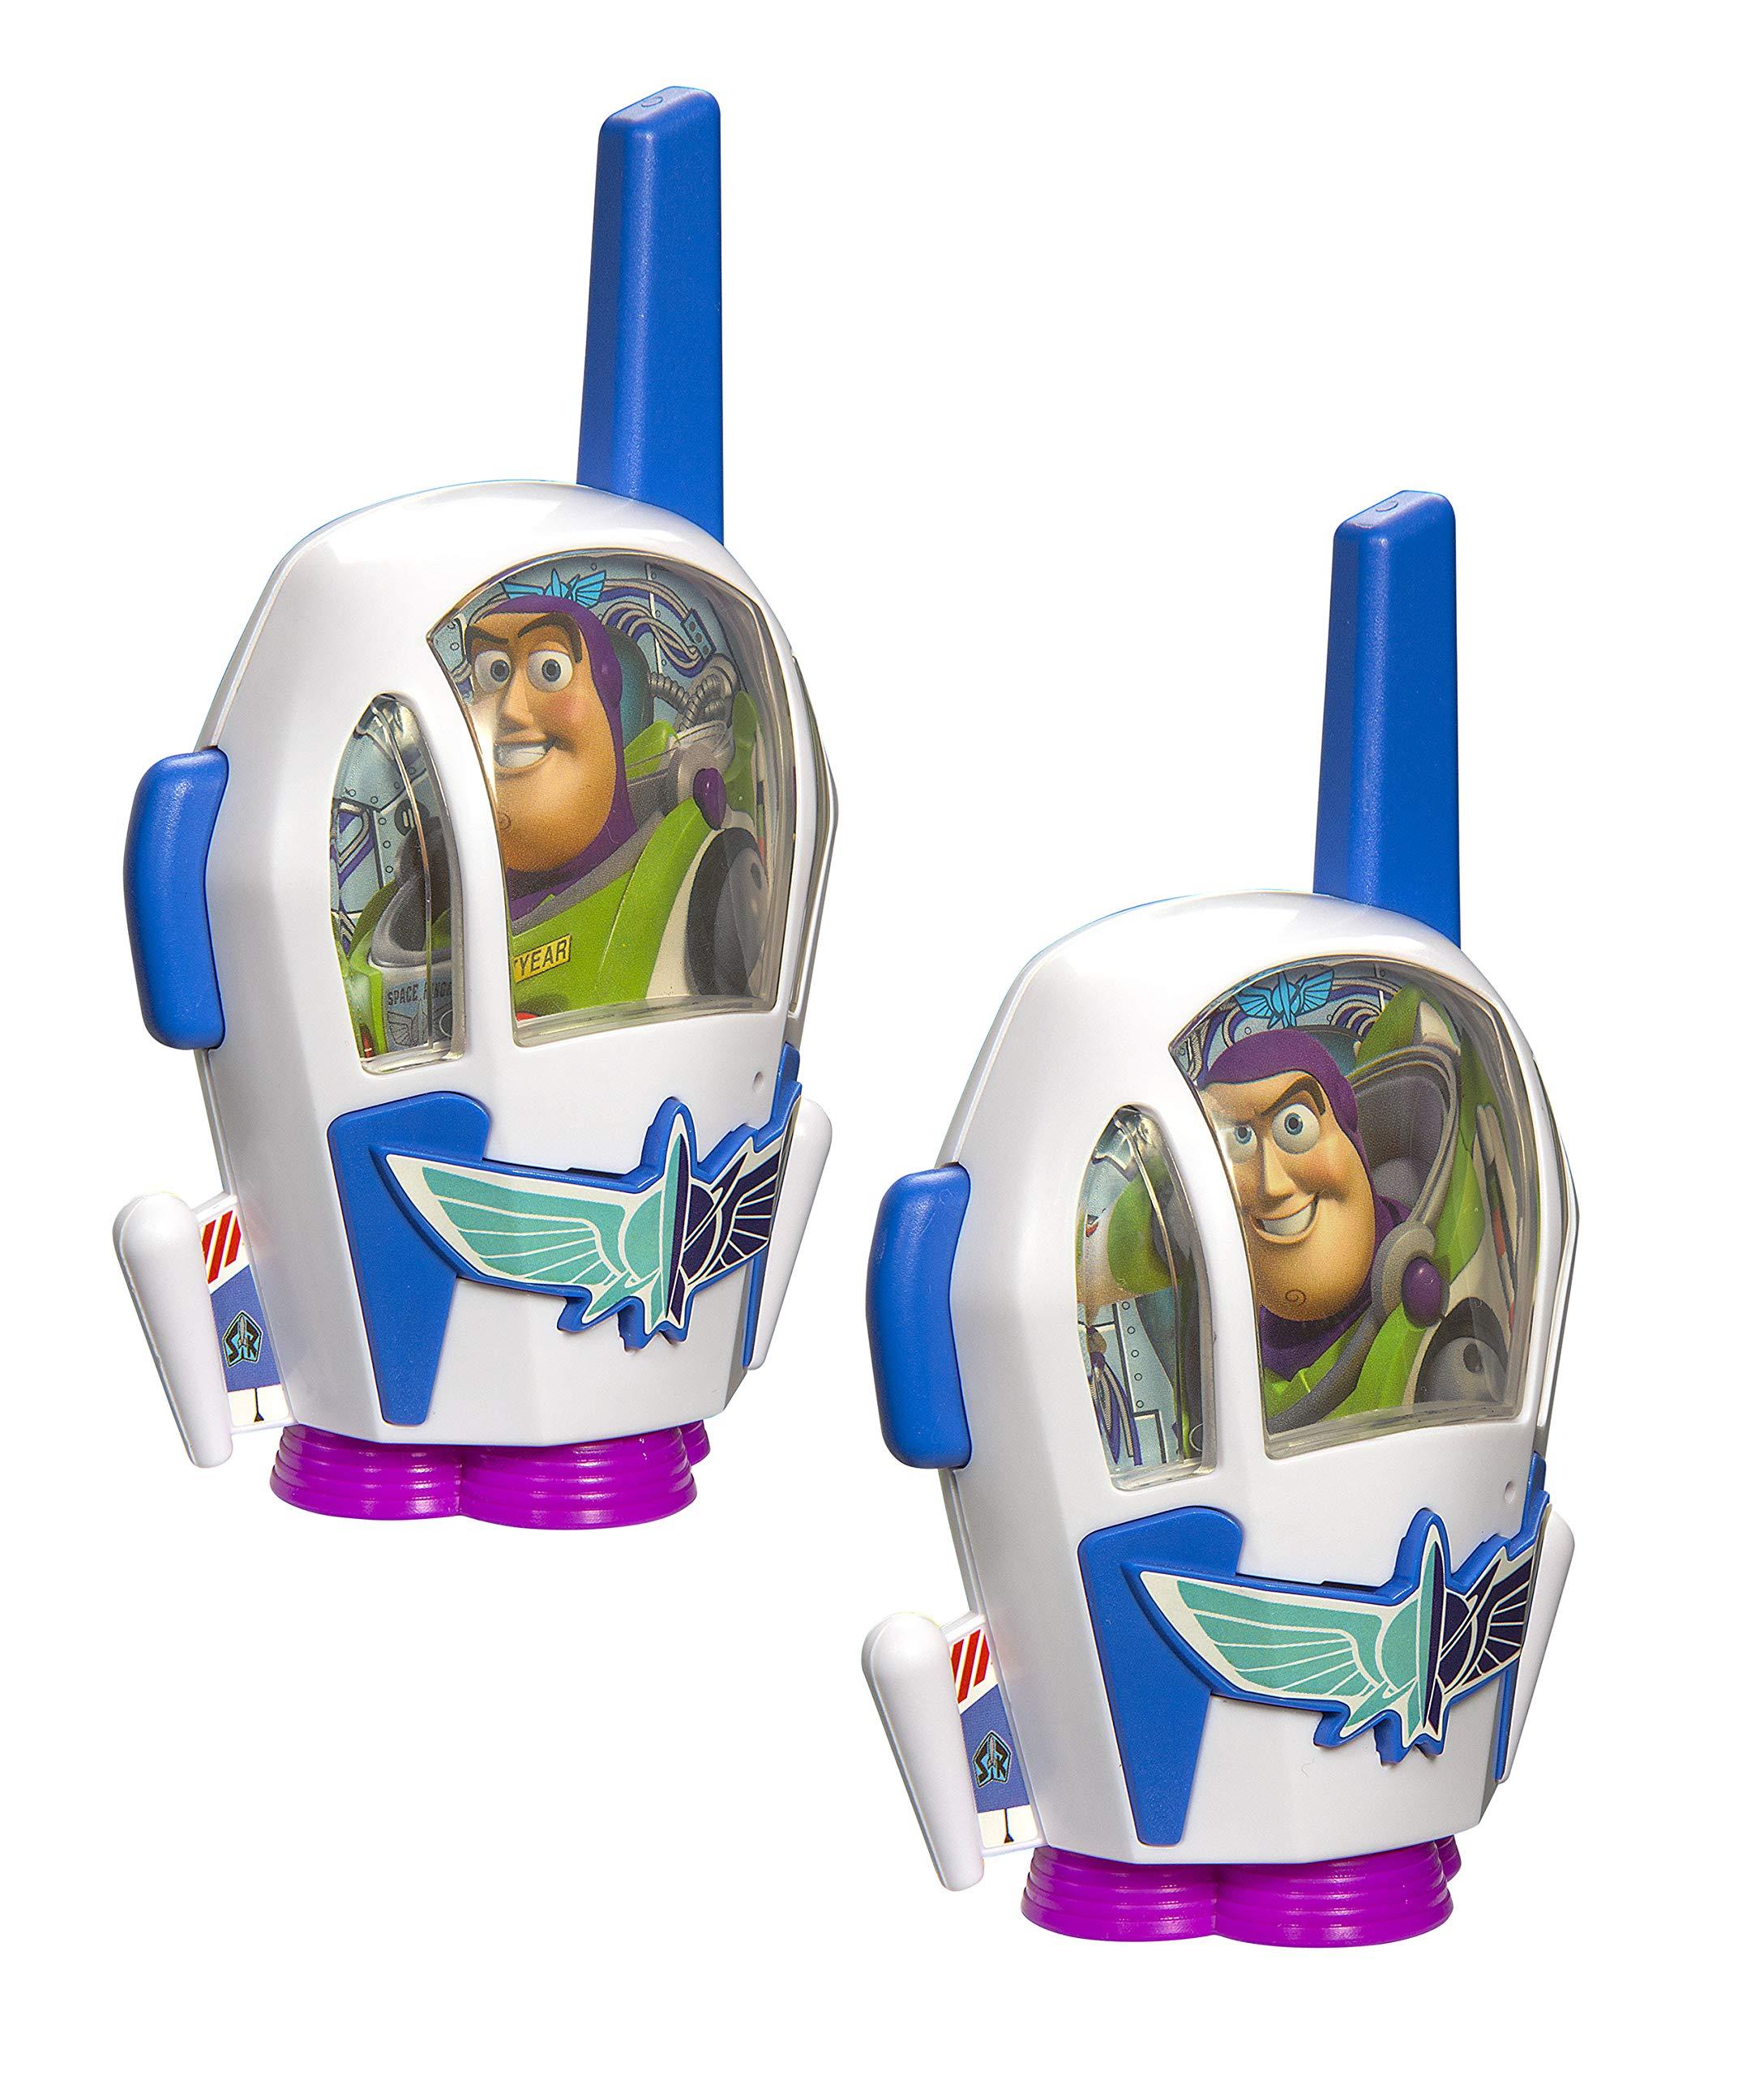 Toy Story 4 Buzz Lightyear Kids Walkie Talkies for Kids Static Free Extended Range Kid Friendly Easy to Use 2 Way Radio Toy Handheld Walkie Talkies Team Work Play Indoors or Outdoors by eKids (Image #3)